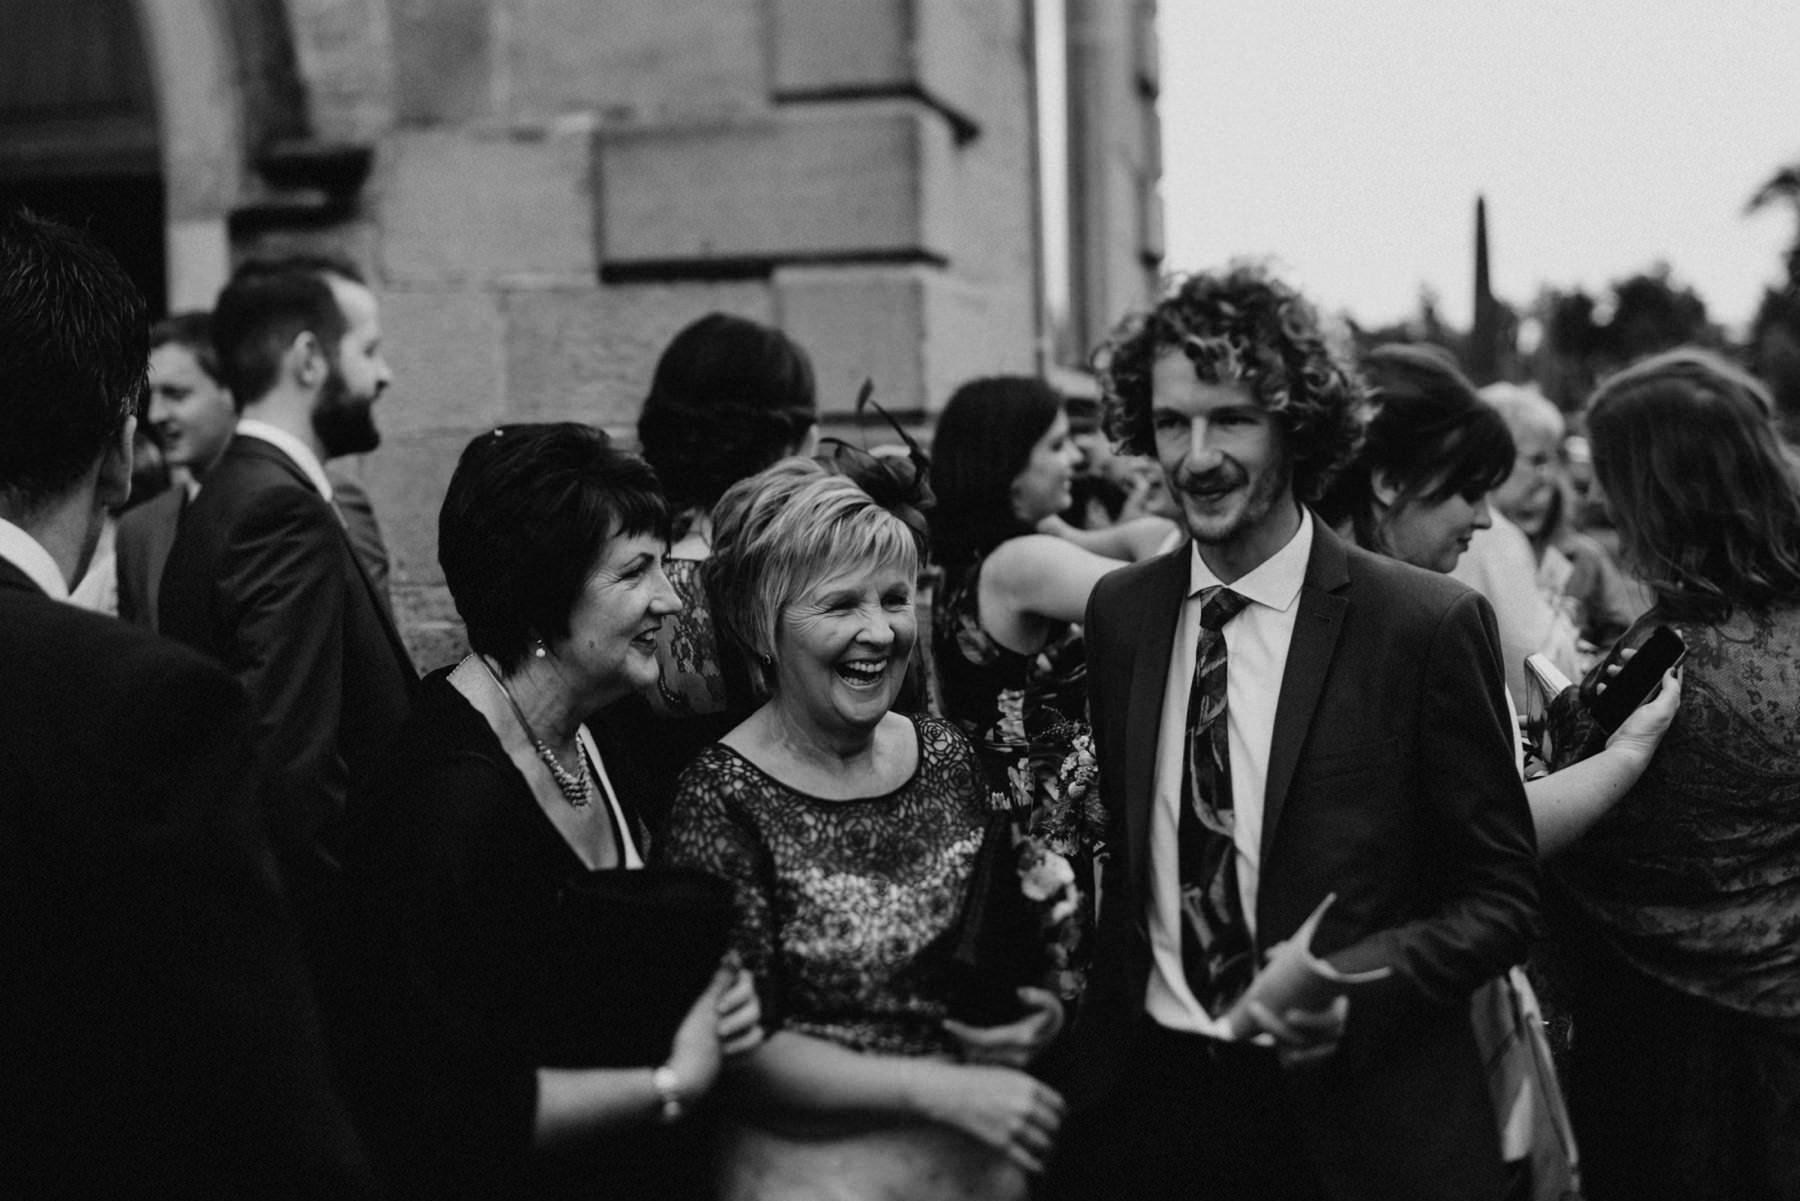 raceview mill wedding photographer northern ireland